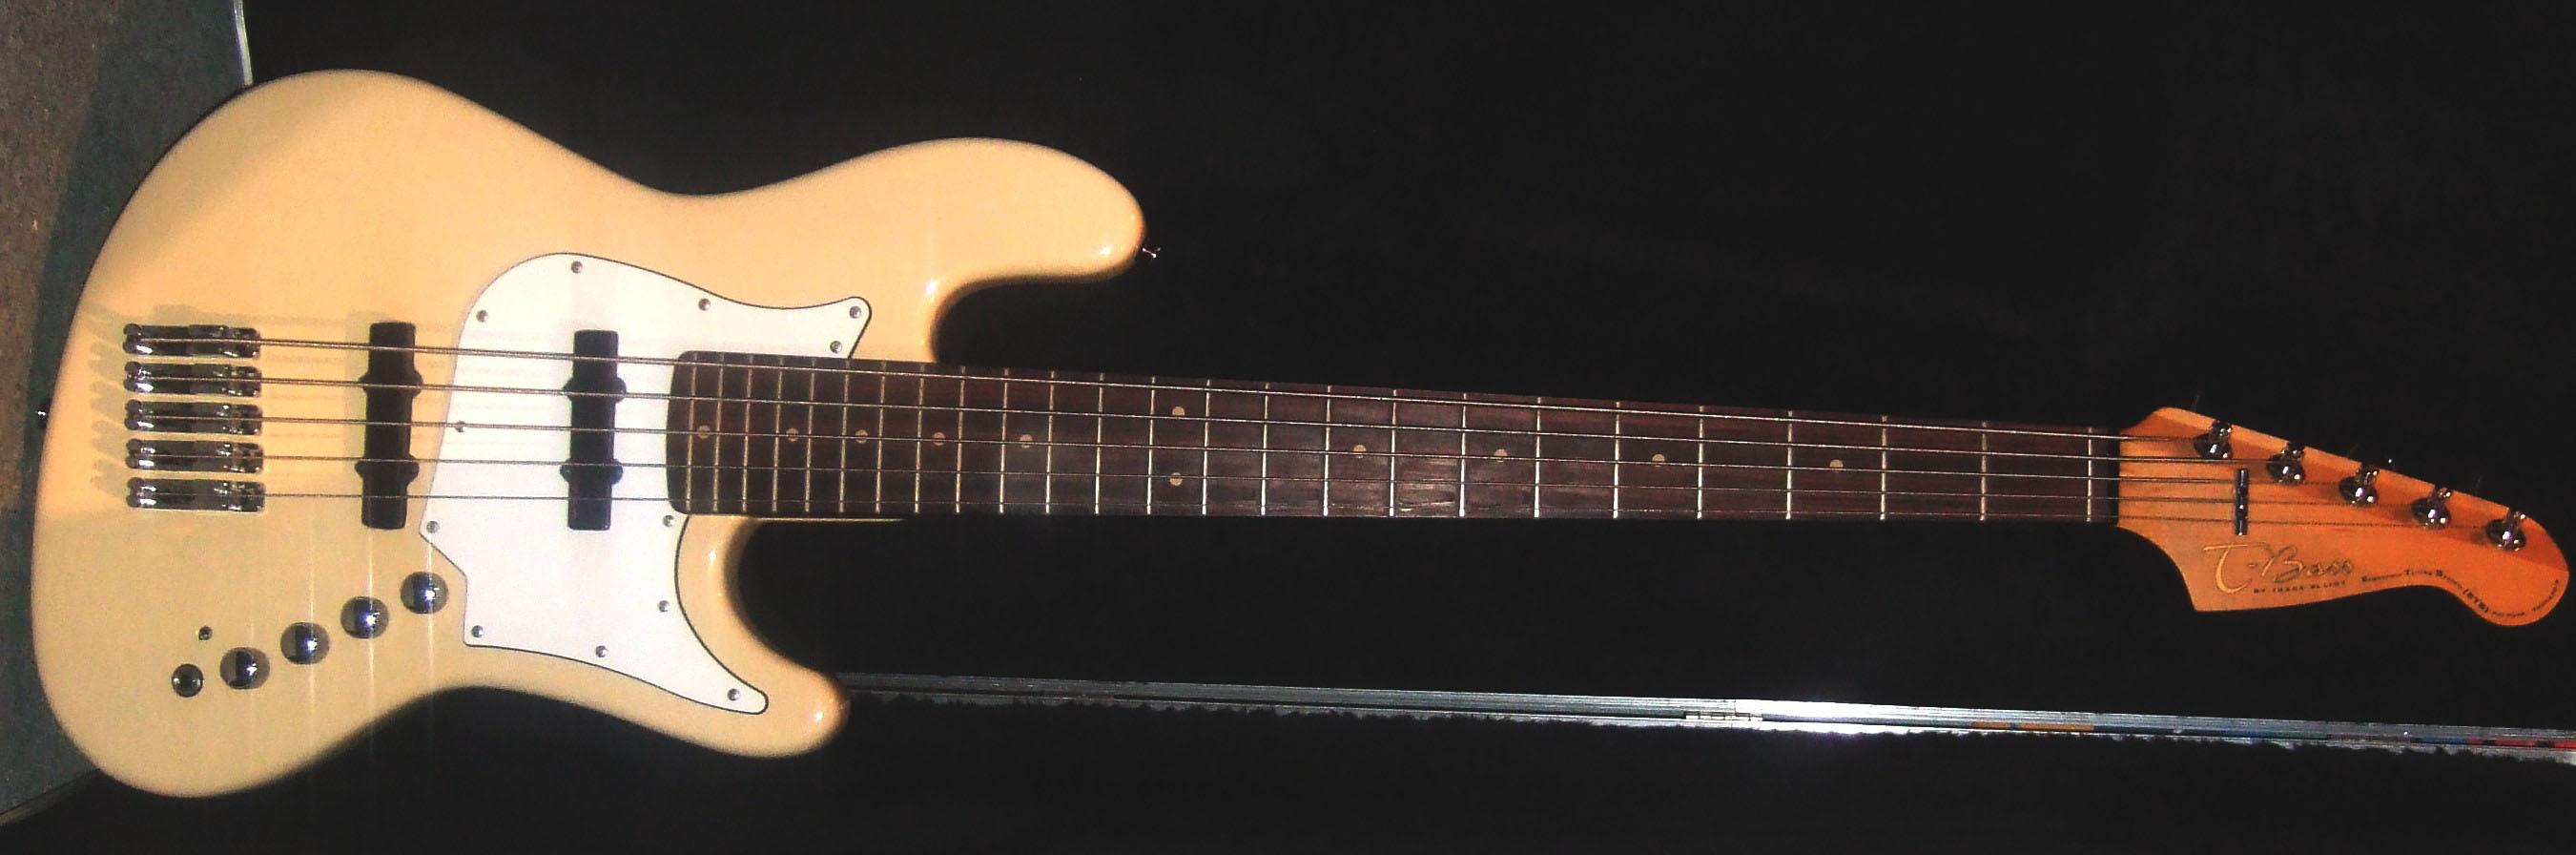 trace-elliot-t-bass-5-cordes-51492.jpg